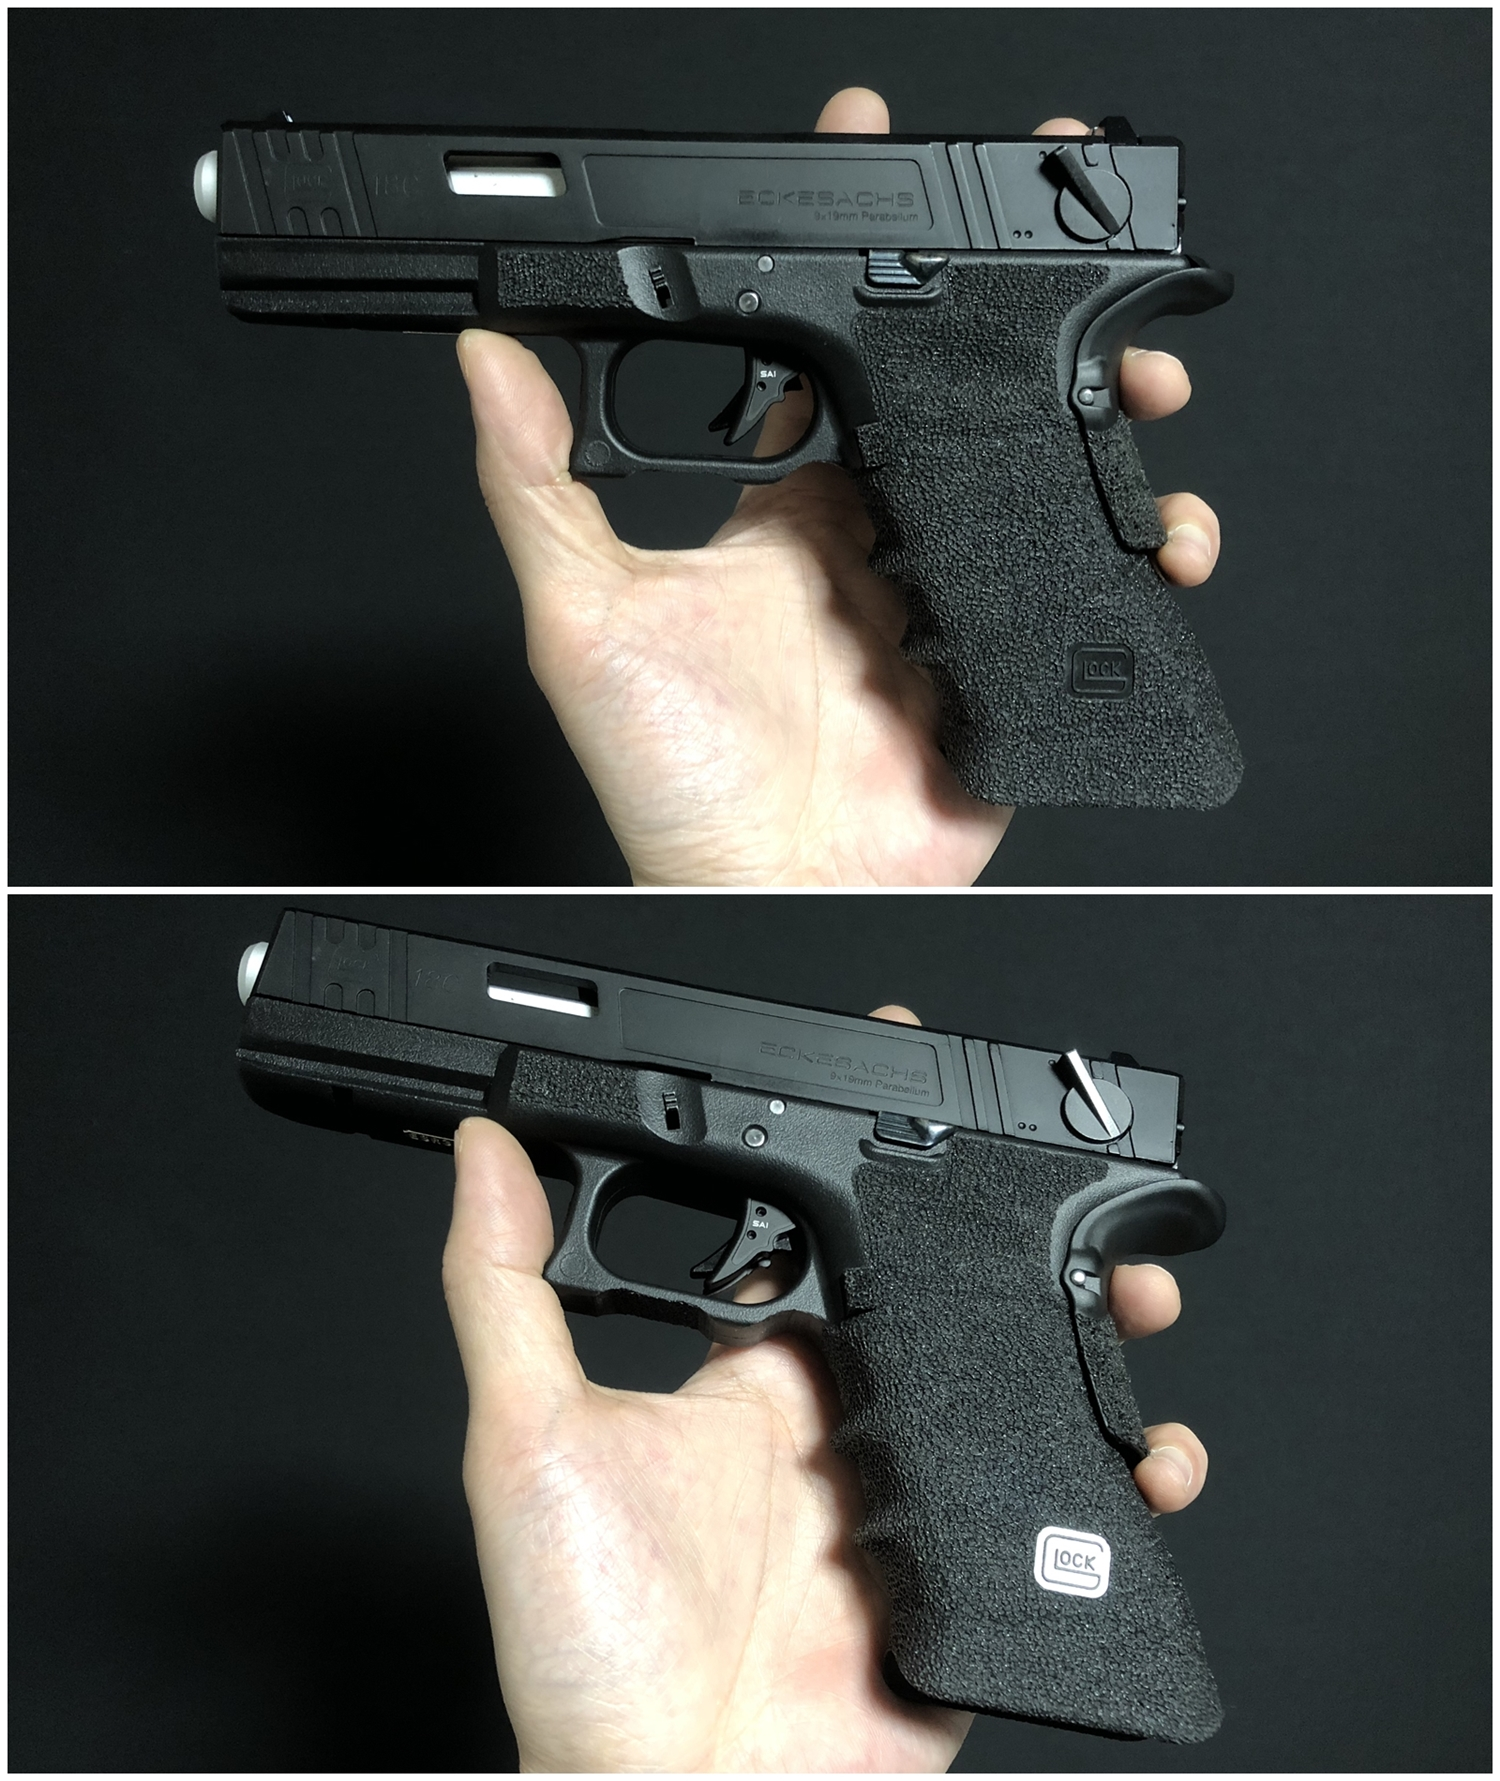 24 GunsModify GLOCK SAI アジャスタブルトリガー Ver3 GM0026 GM0079 に交換してみた! GLOCK G18C カスタム 購入 分解 取付 交換 取付方法 レビュー!!